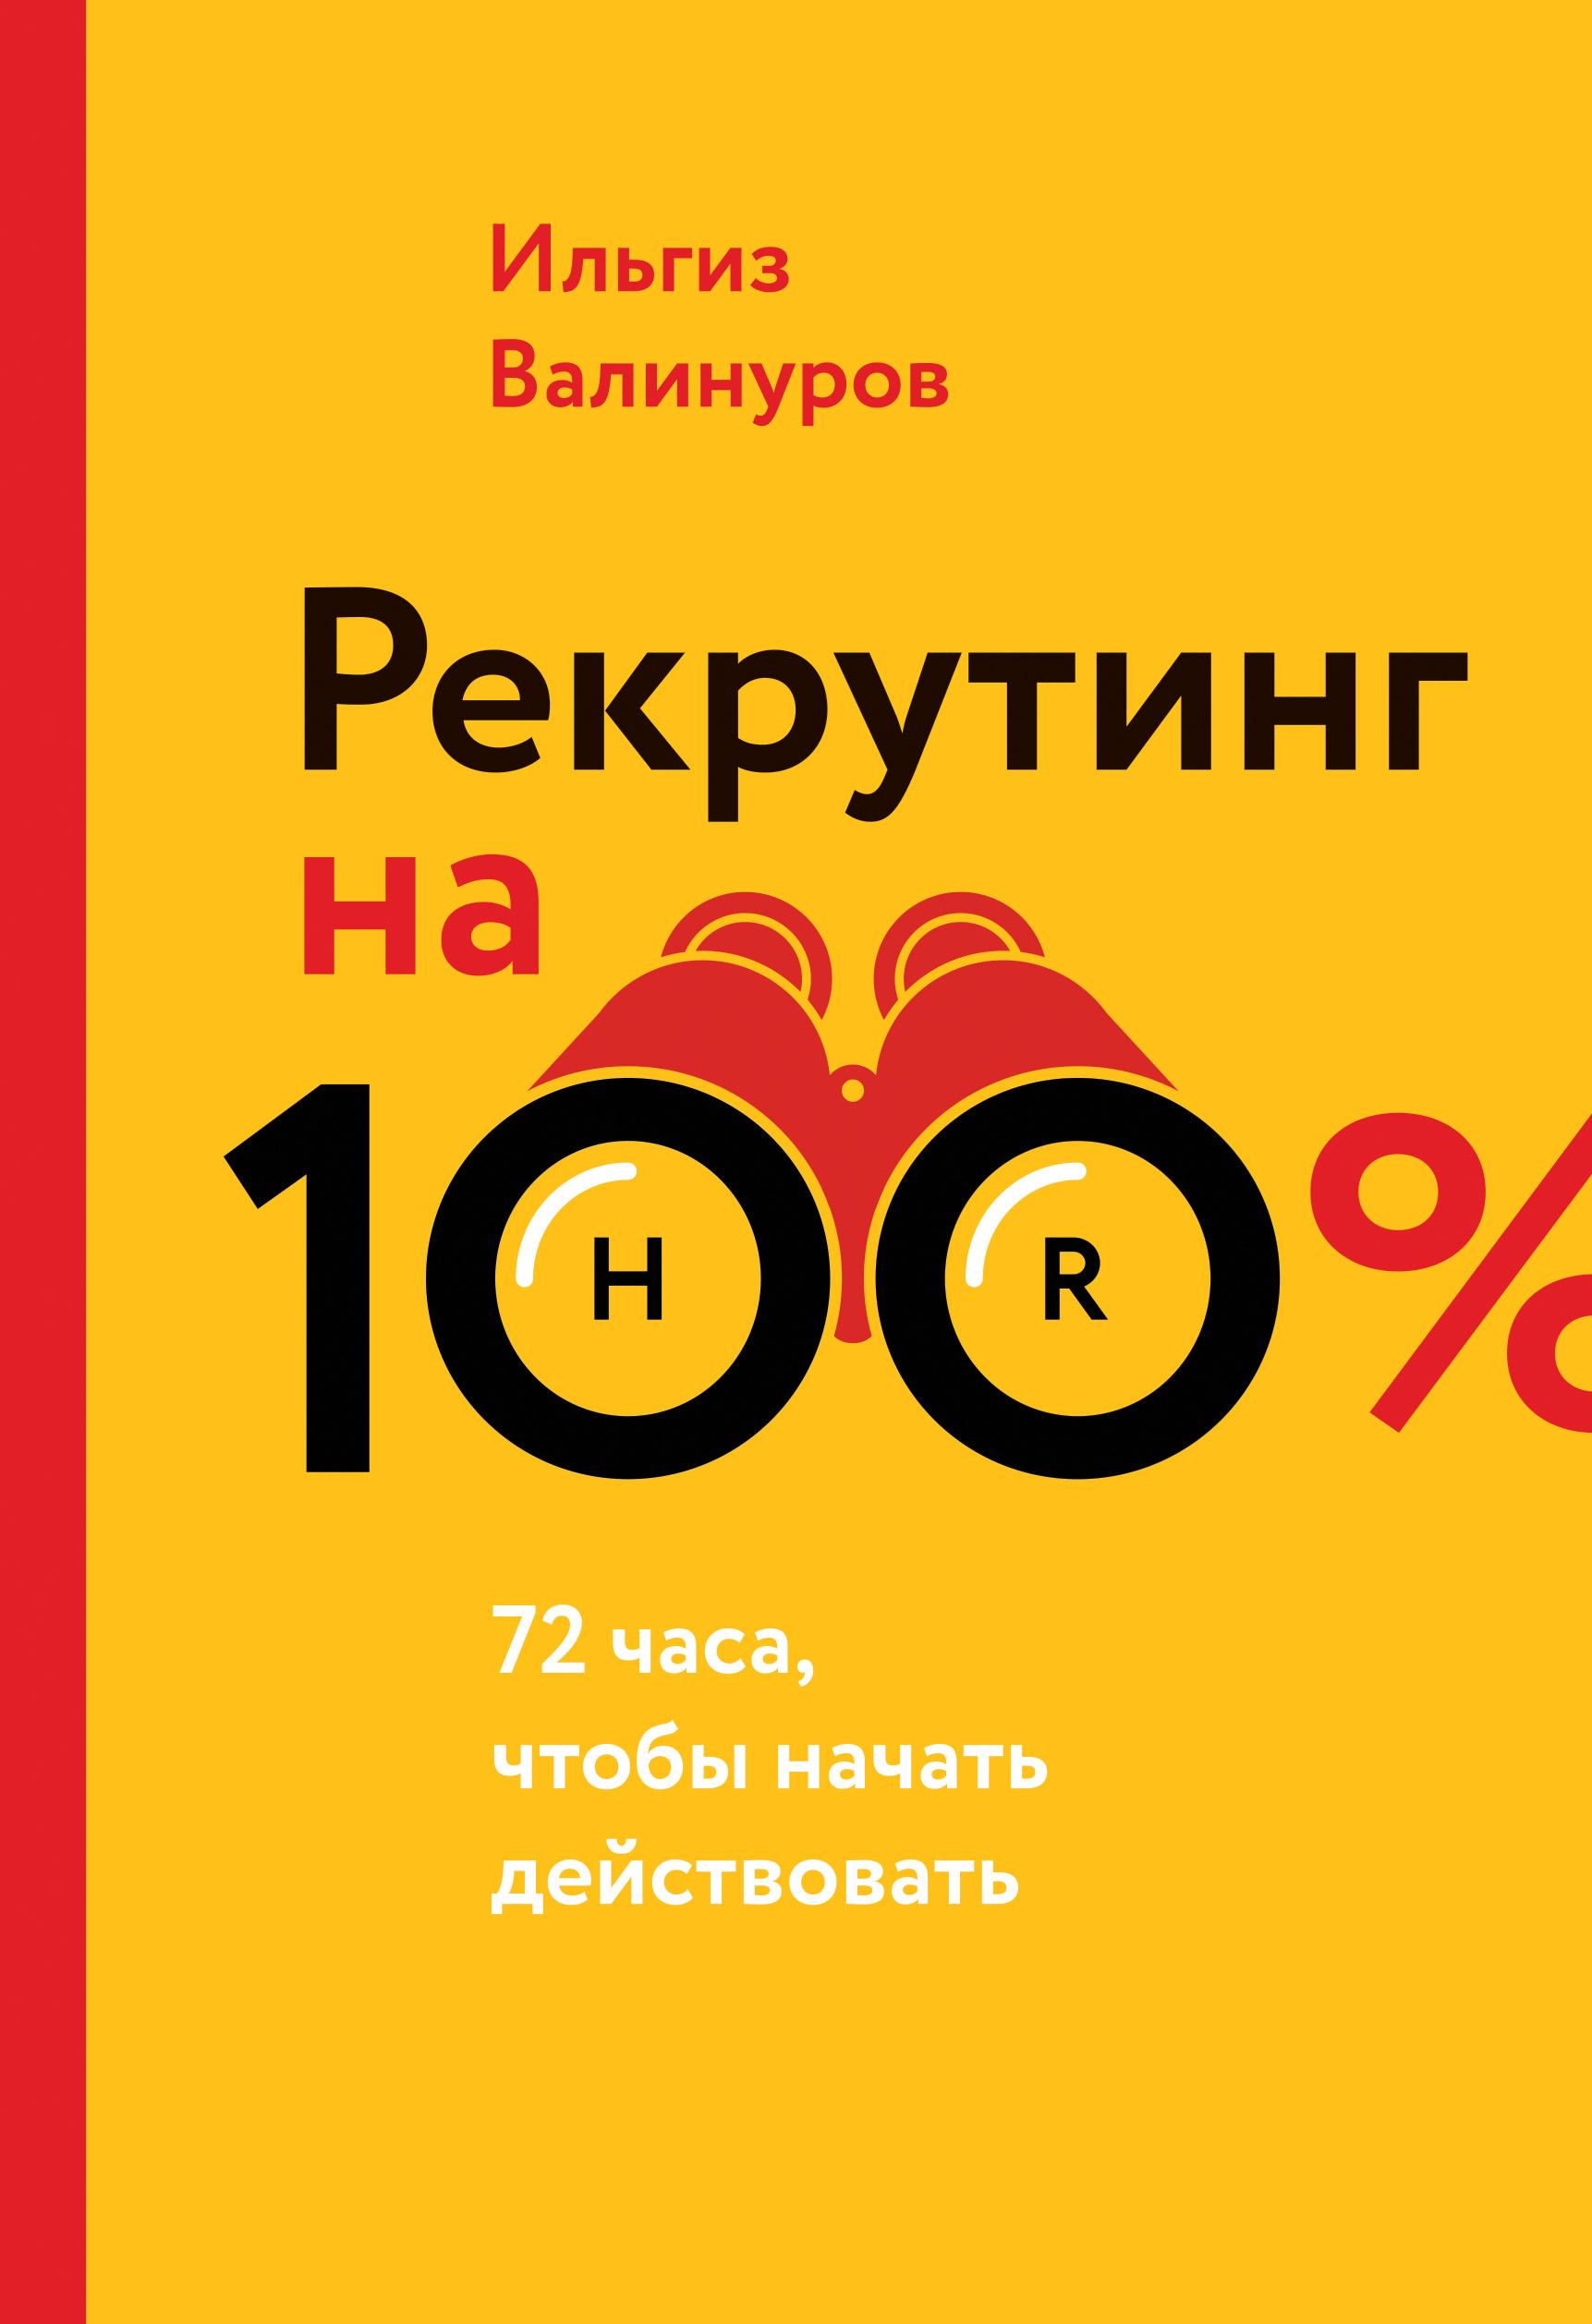 Рекрутинг на 100% - Валинуров И